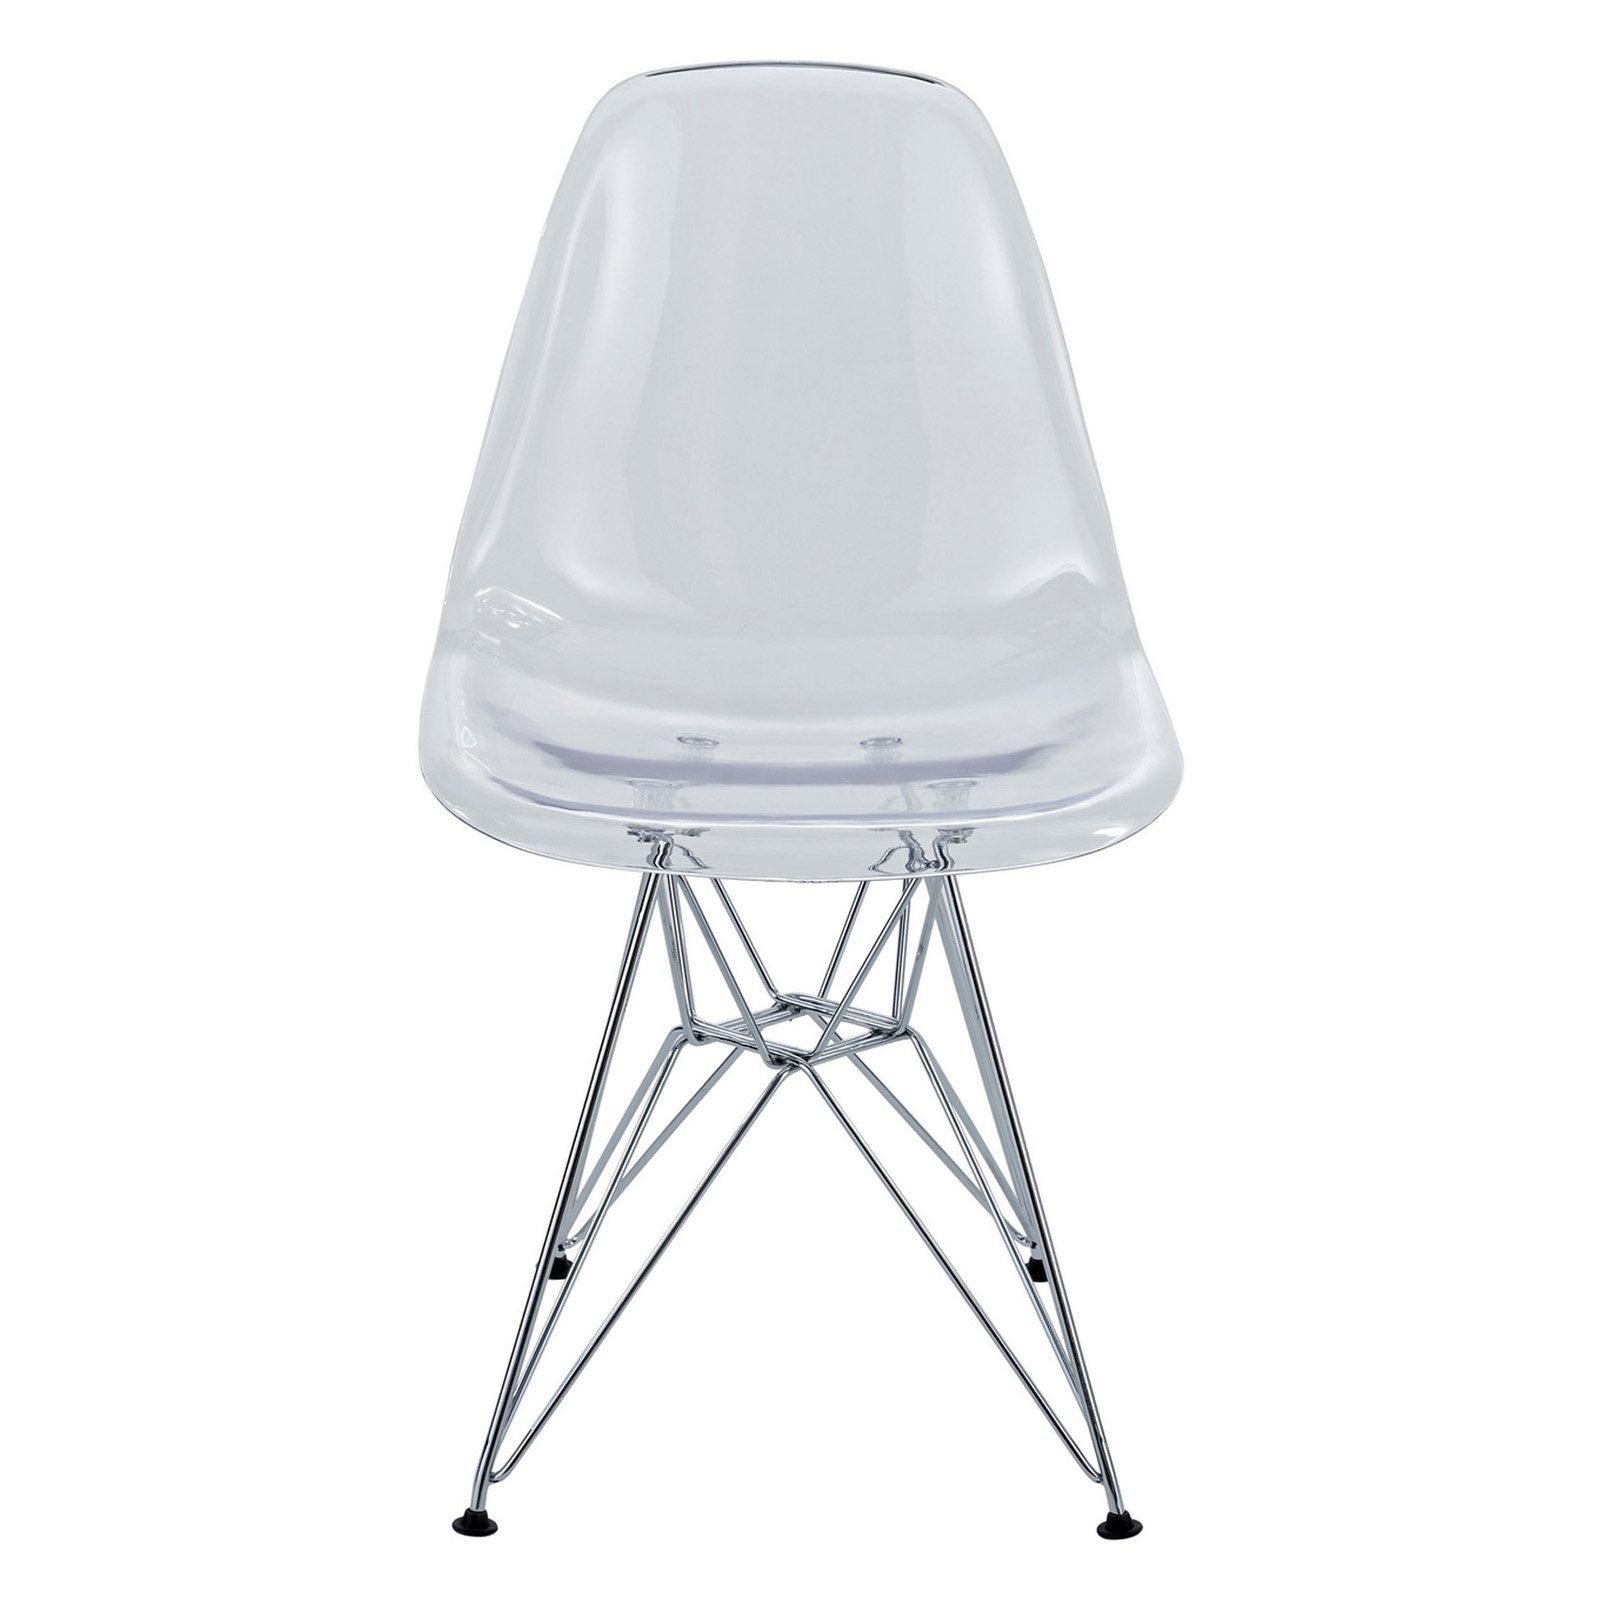 Modway Eiffel Dining Side Chair Clear Walmartcom : 70539e67 58ca 4828 ada0 b3380e518039184356814dd1f4c74f18aaeb345fc2778 from www.walmart.com size 560 x 560 jpeg 20kB